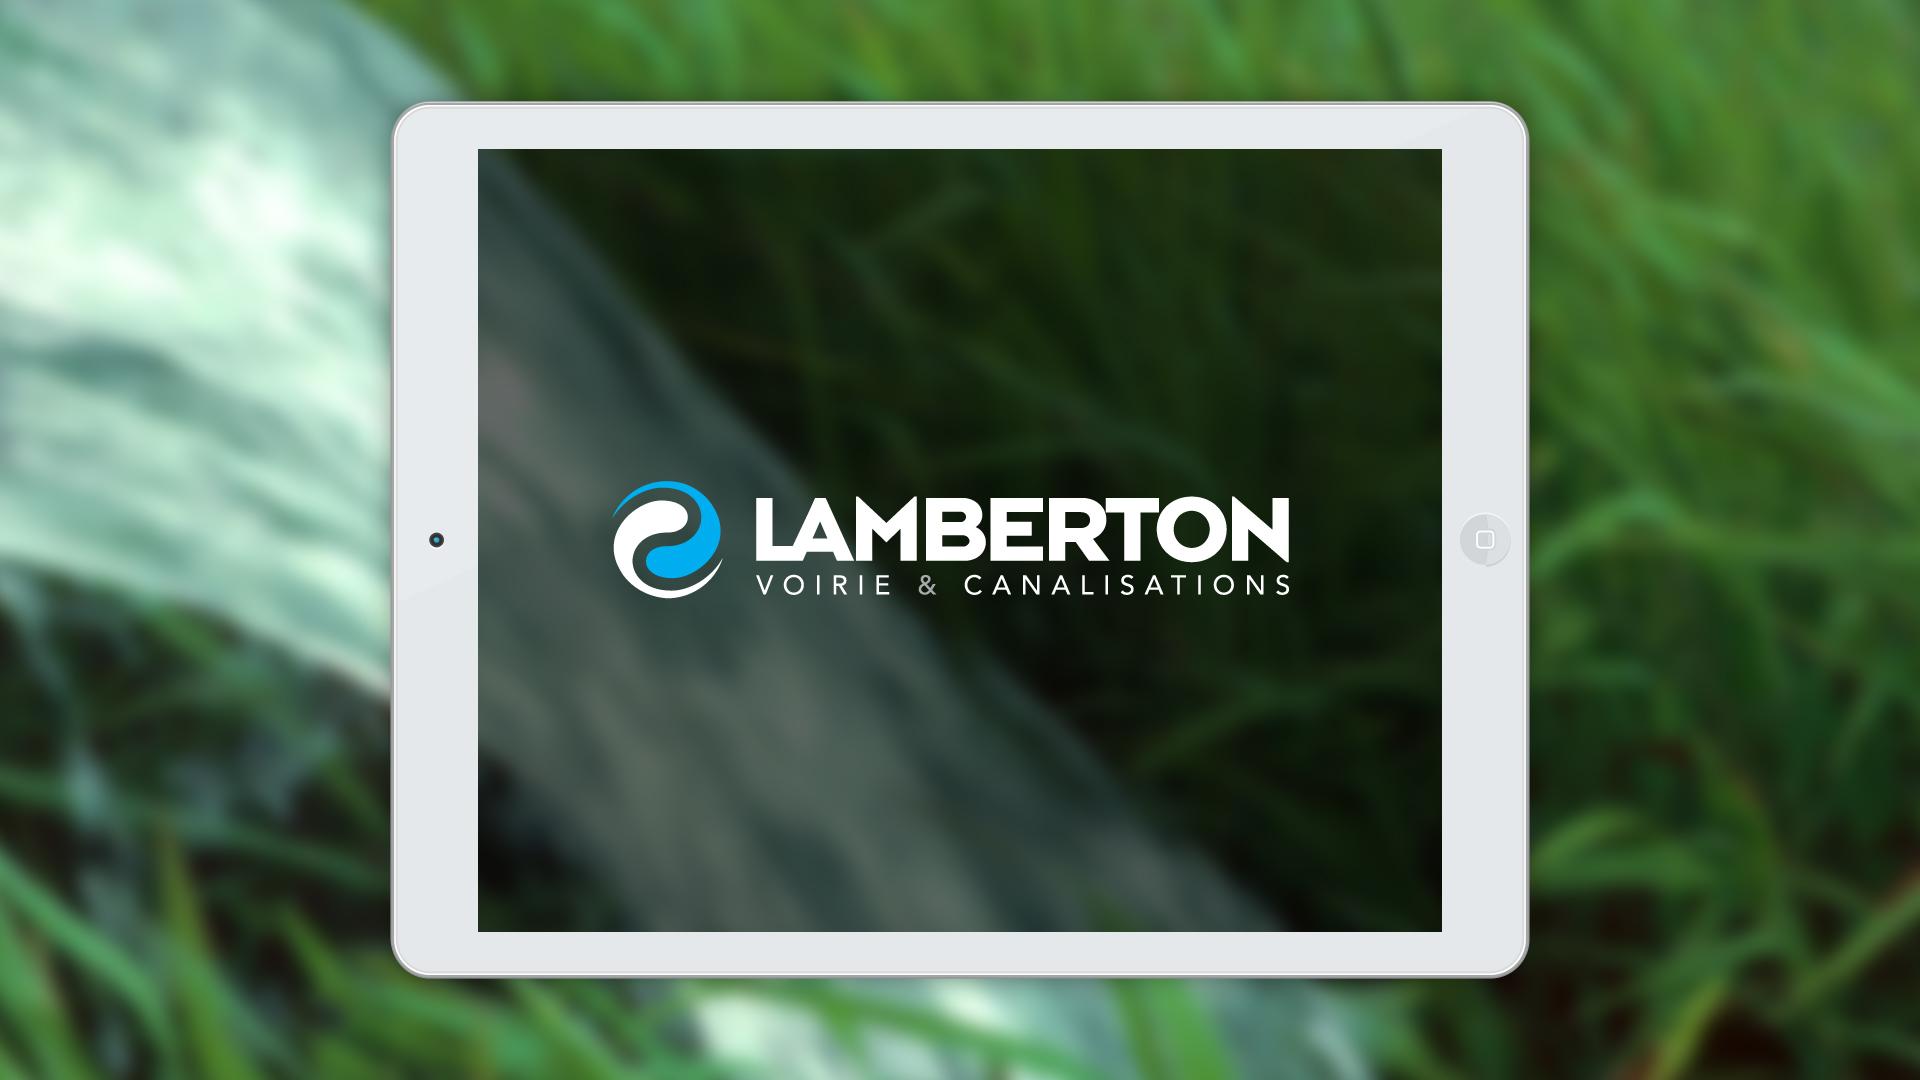 lamberton-creation-logo-enseigne-site-internet-caconcept-alexis-cretin-graphiste-montpellier